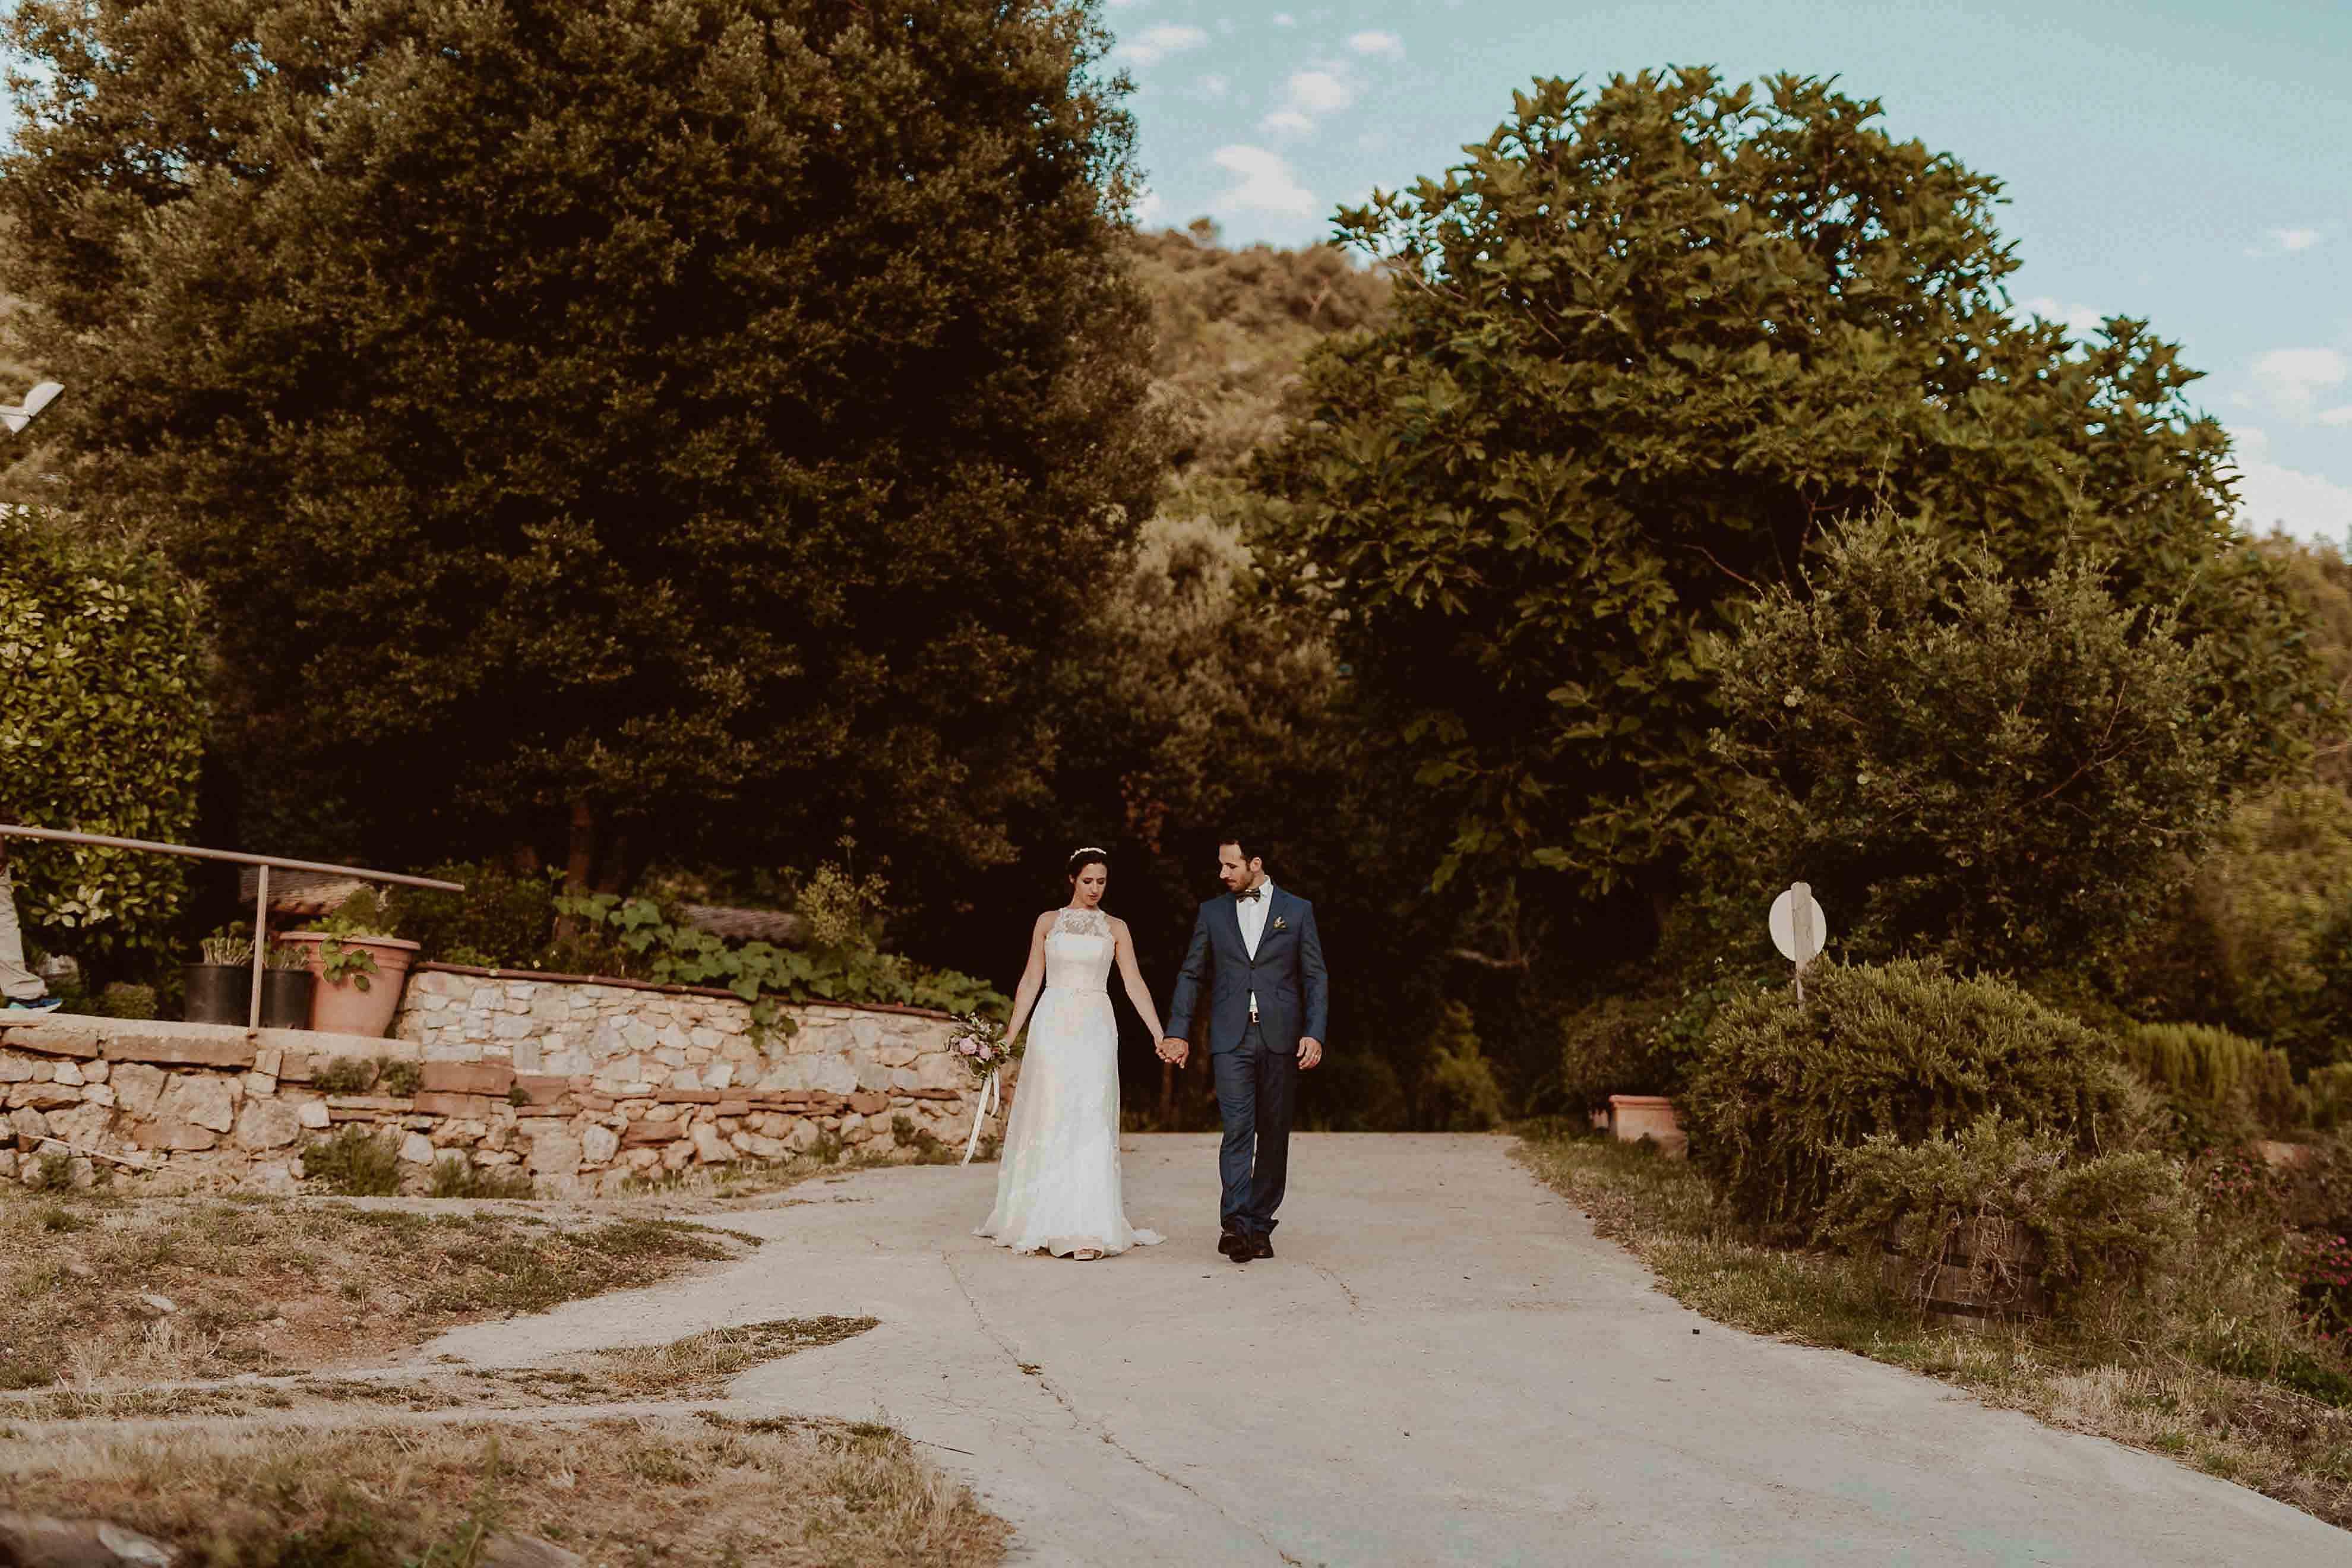 Boda rústica en la montaña. fotgrafo de bodas barcelona_069